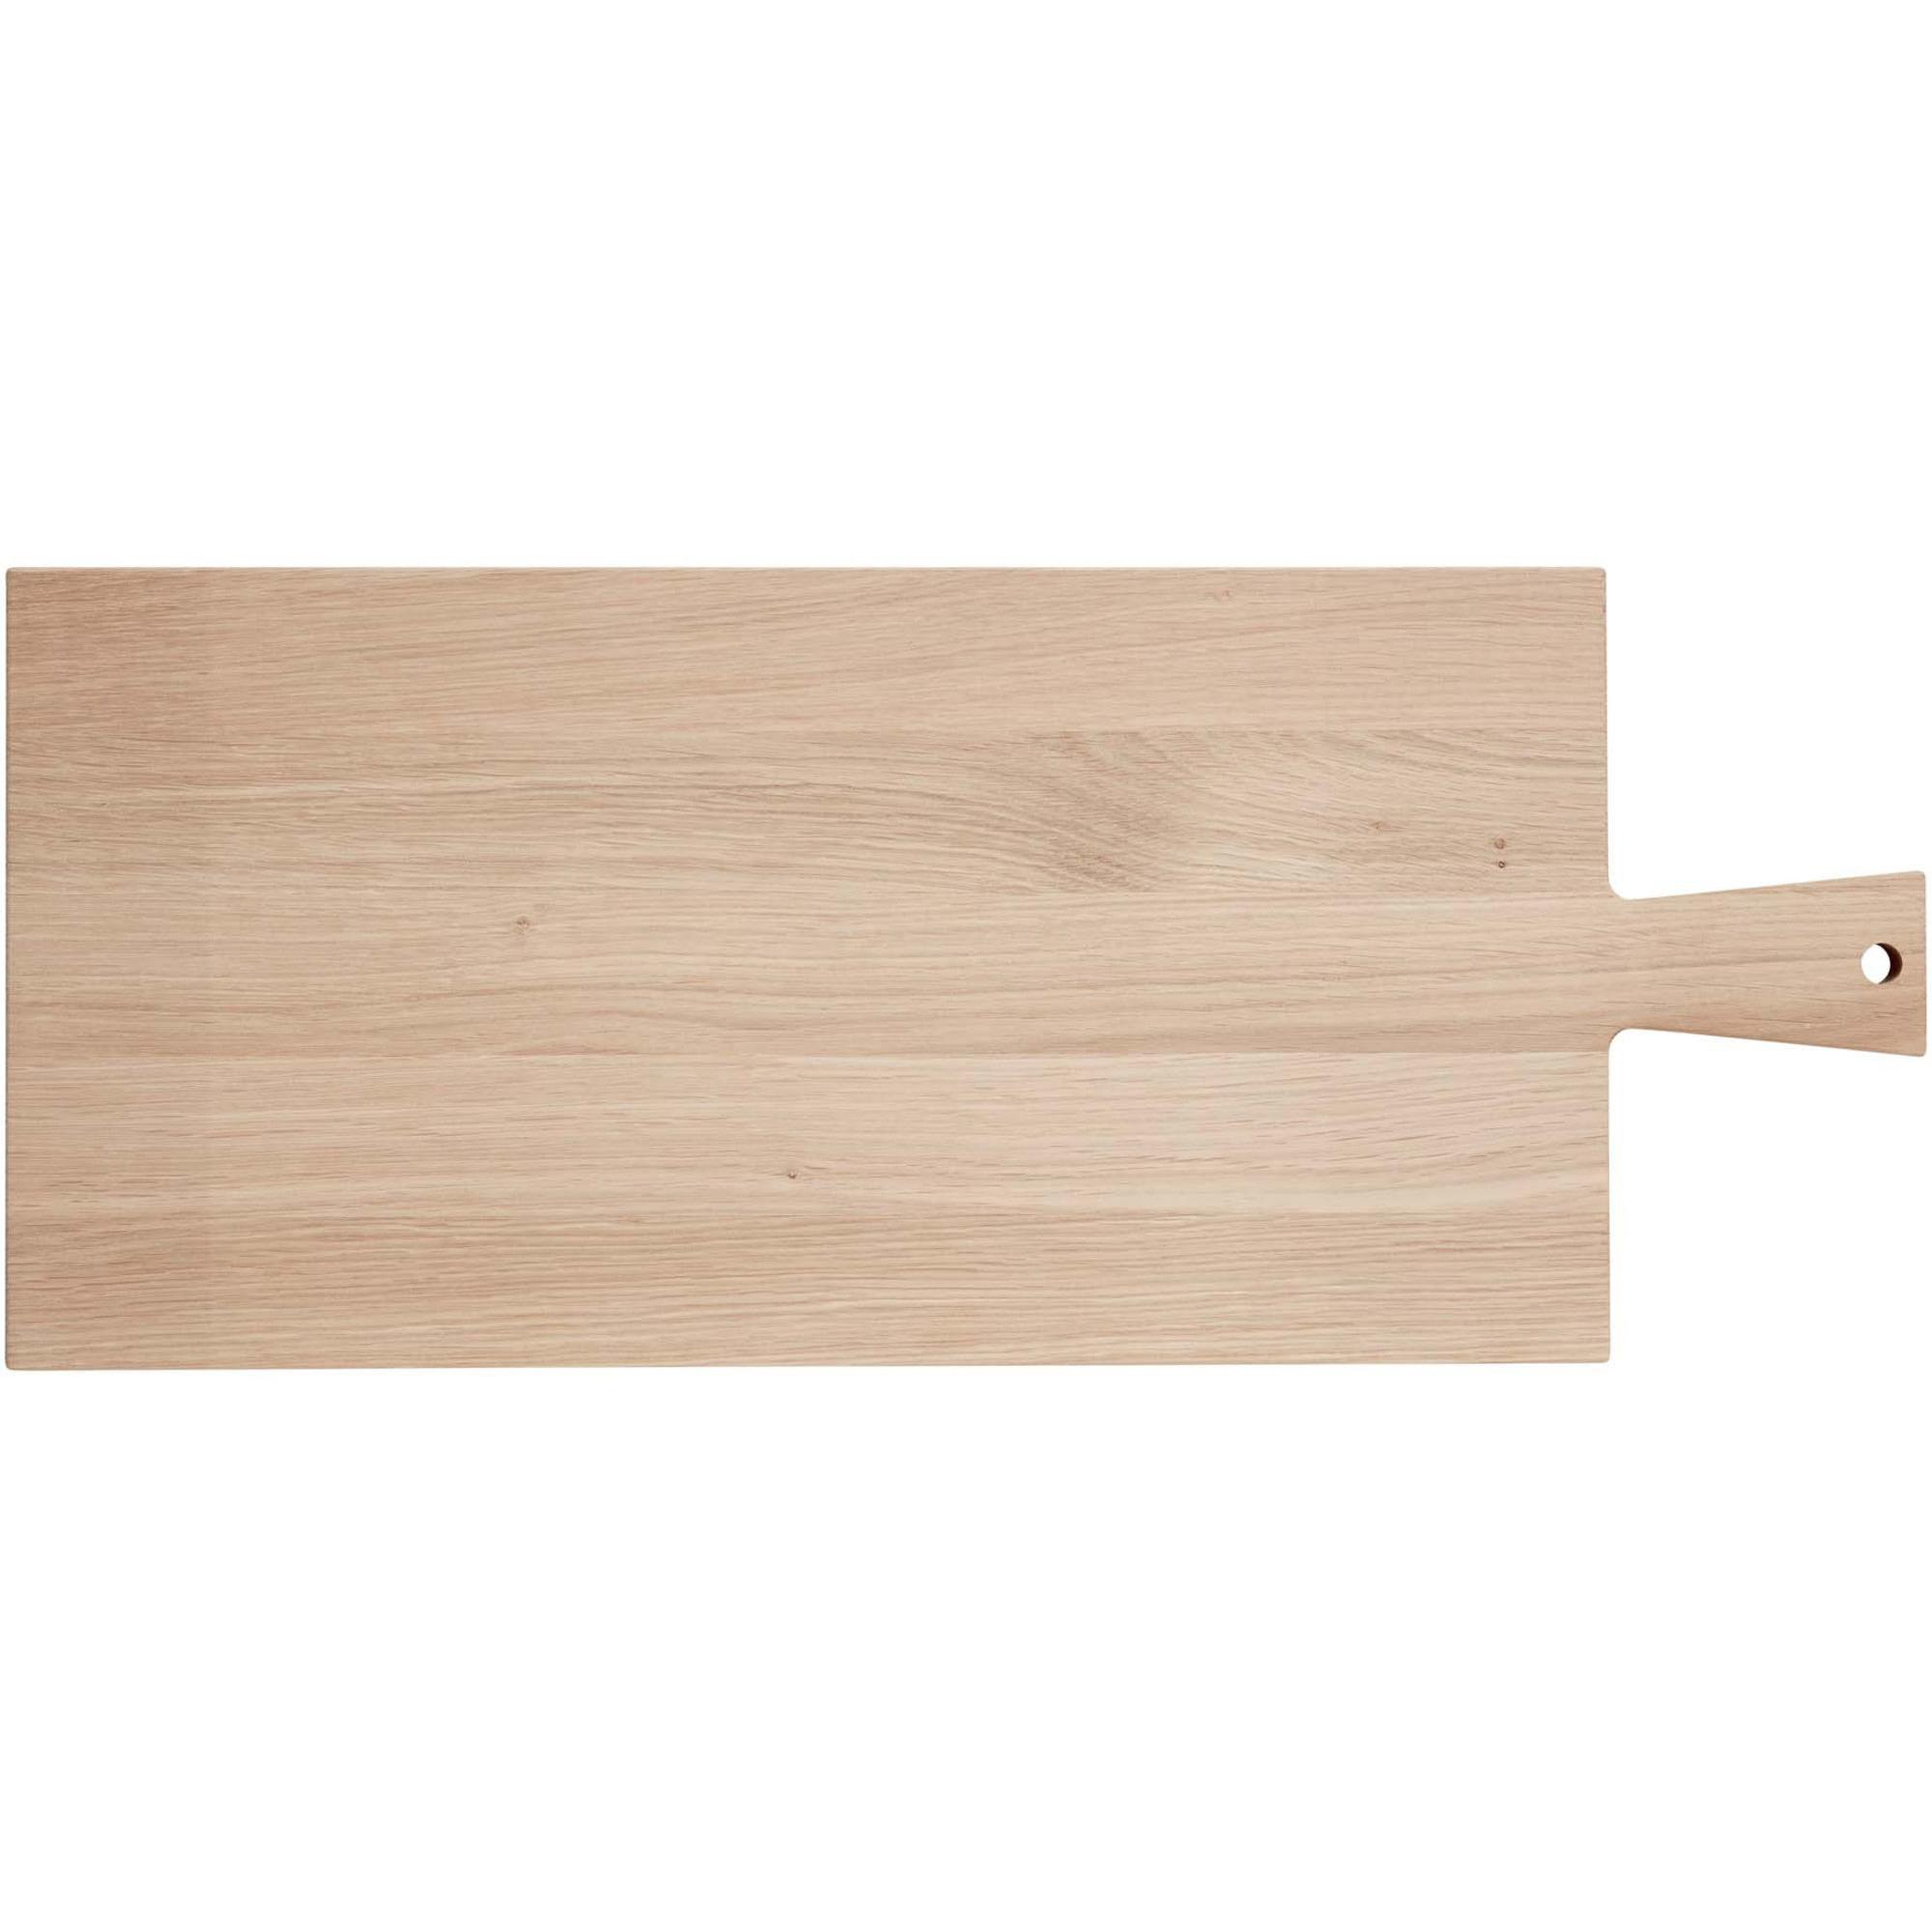 Andersen Furniture Serveringsbricka 60 x 25 cm Oak